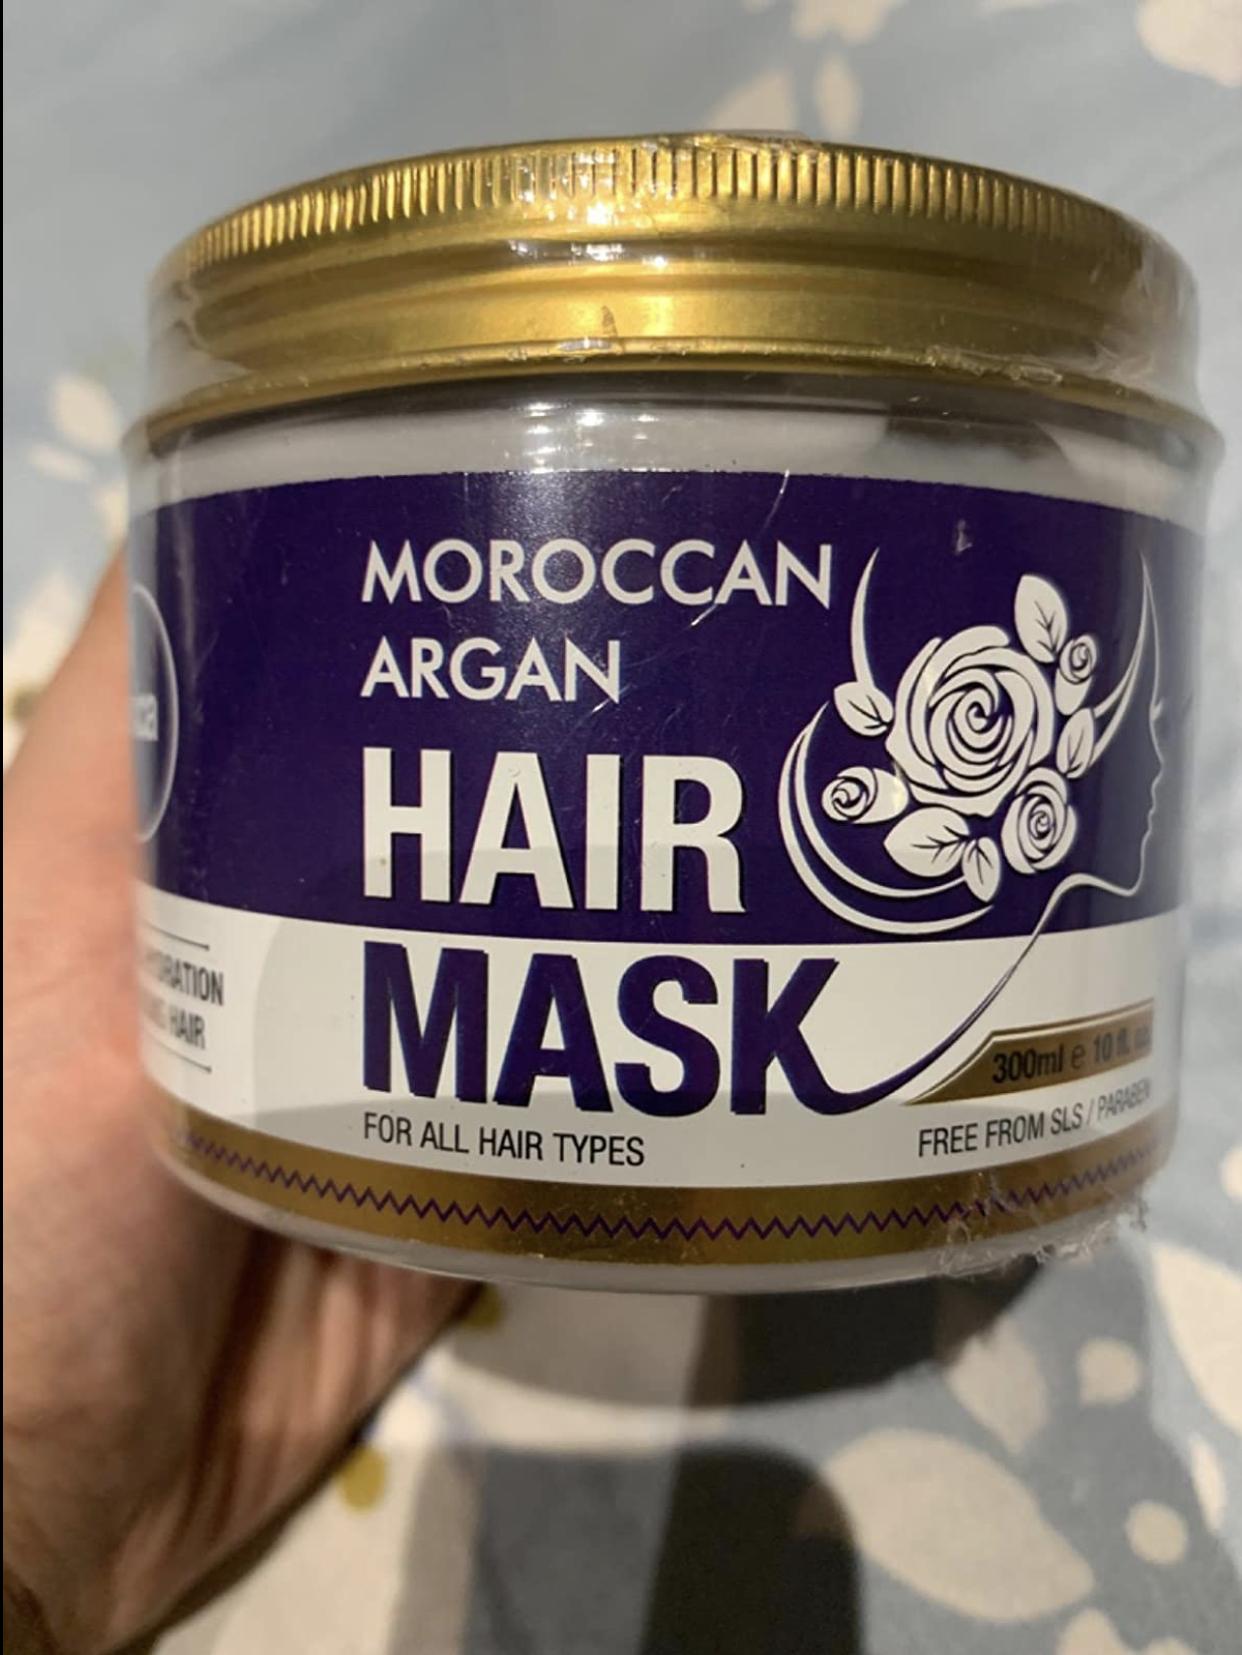 St.Botanica Moroccan Argan Hair Mask-Amazing product-By shivani_makkar-2